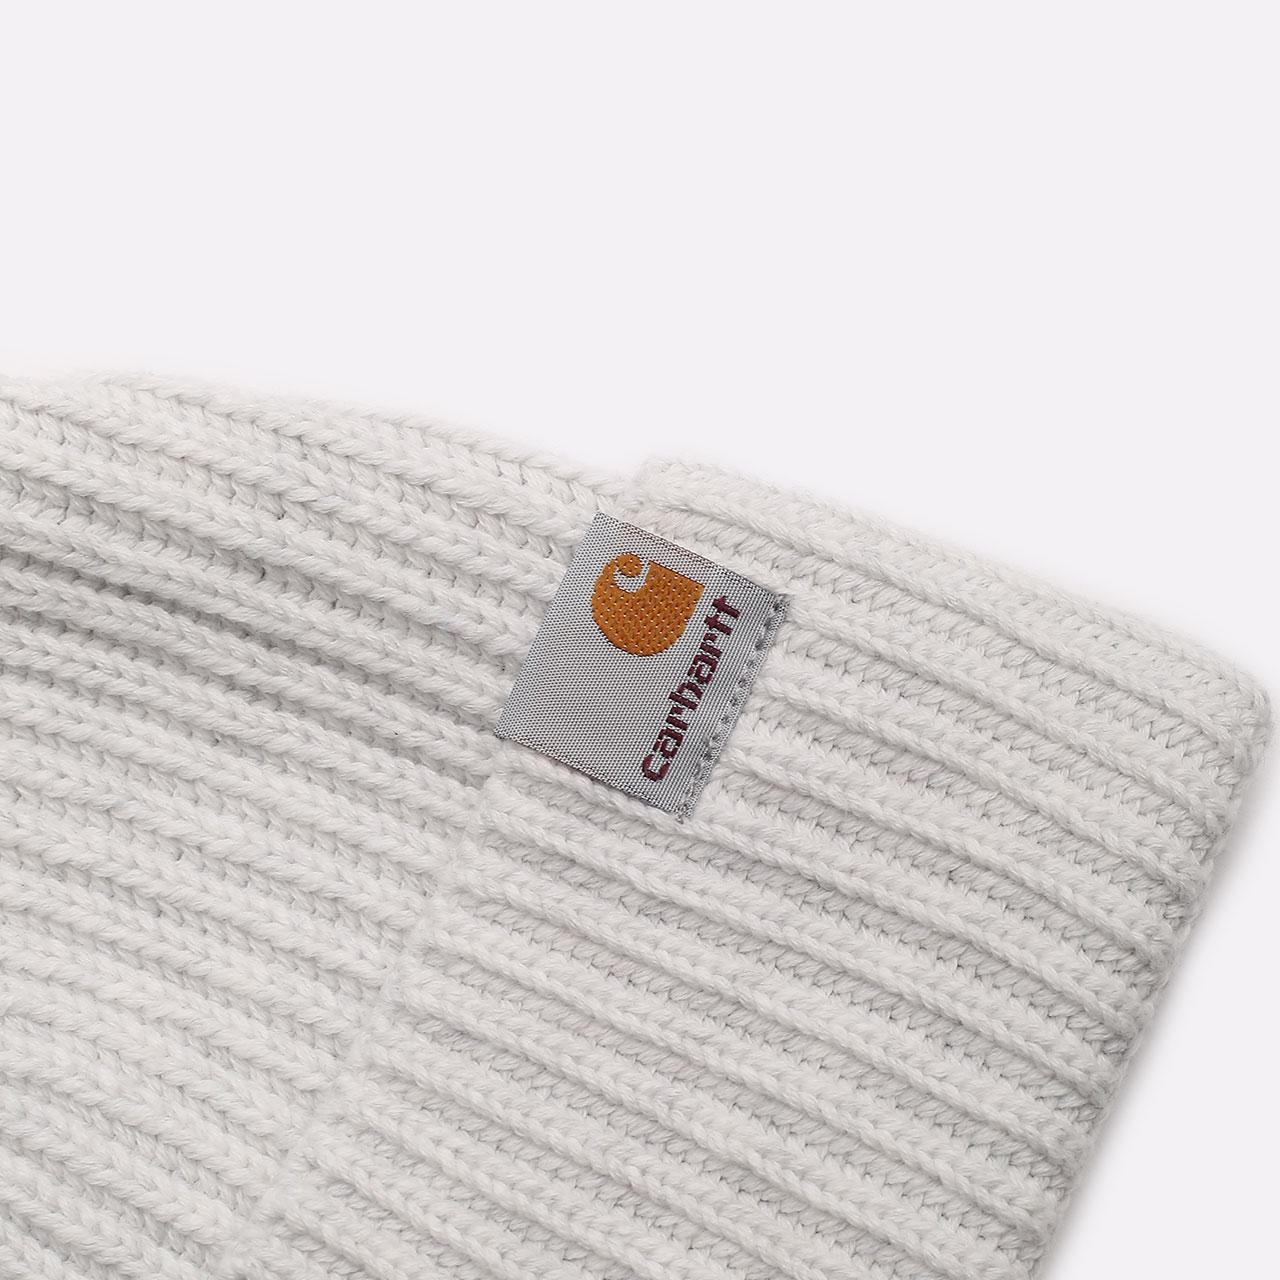 серая шапка Carhartt WIP Burbank Beanie I029491-ash heather - цена, описание, фото 2